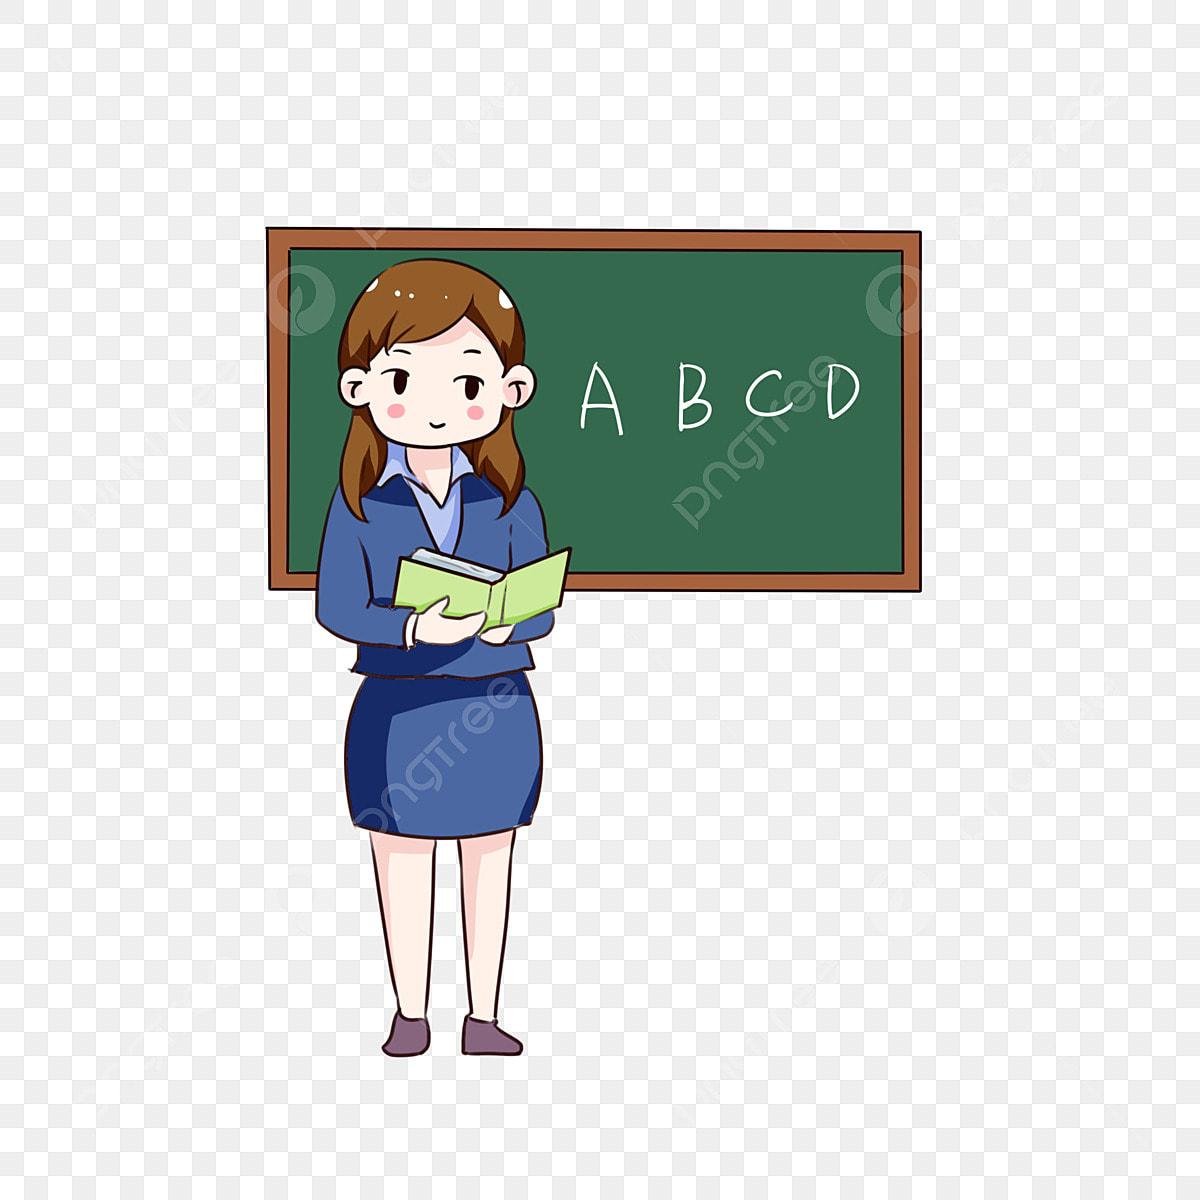 Guru Kecantikan Hari Guru Kartun Tangan Guru Perempuan